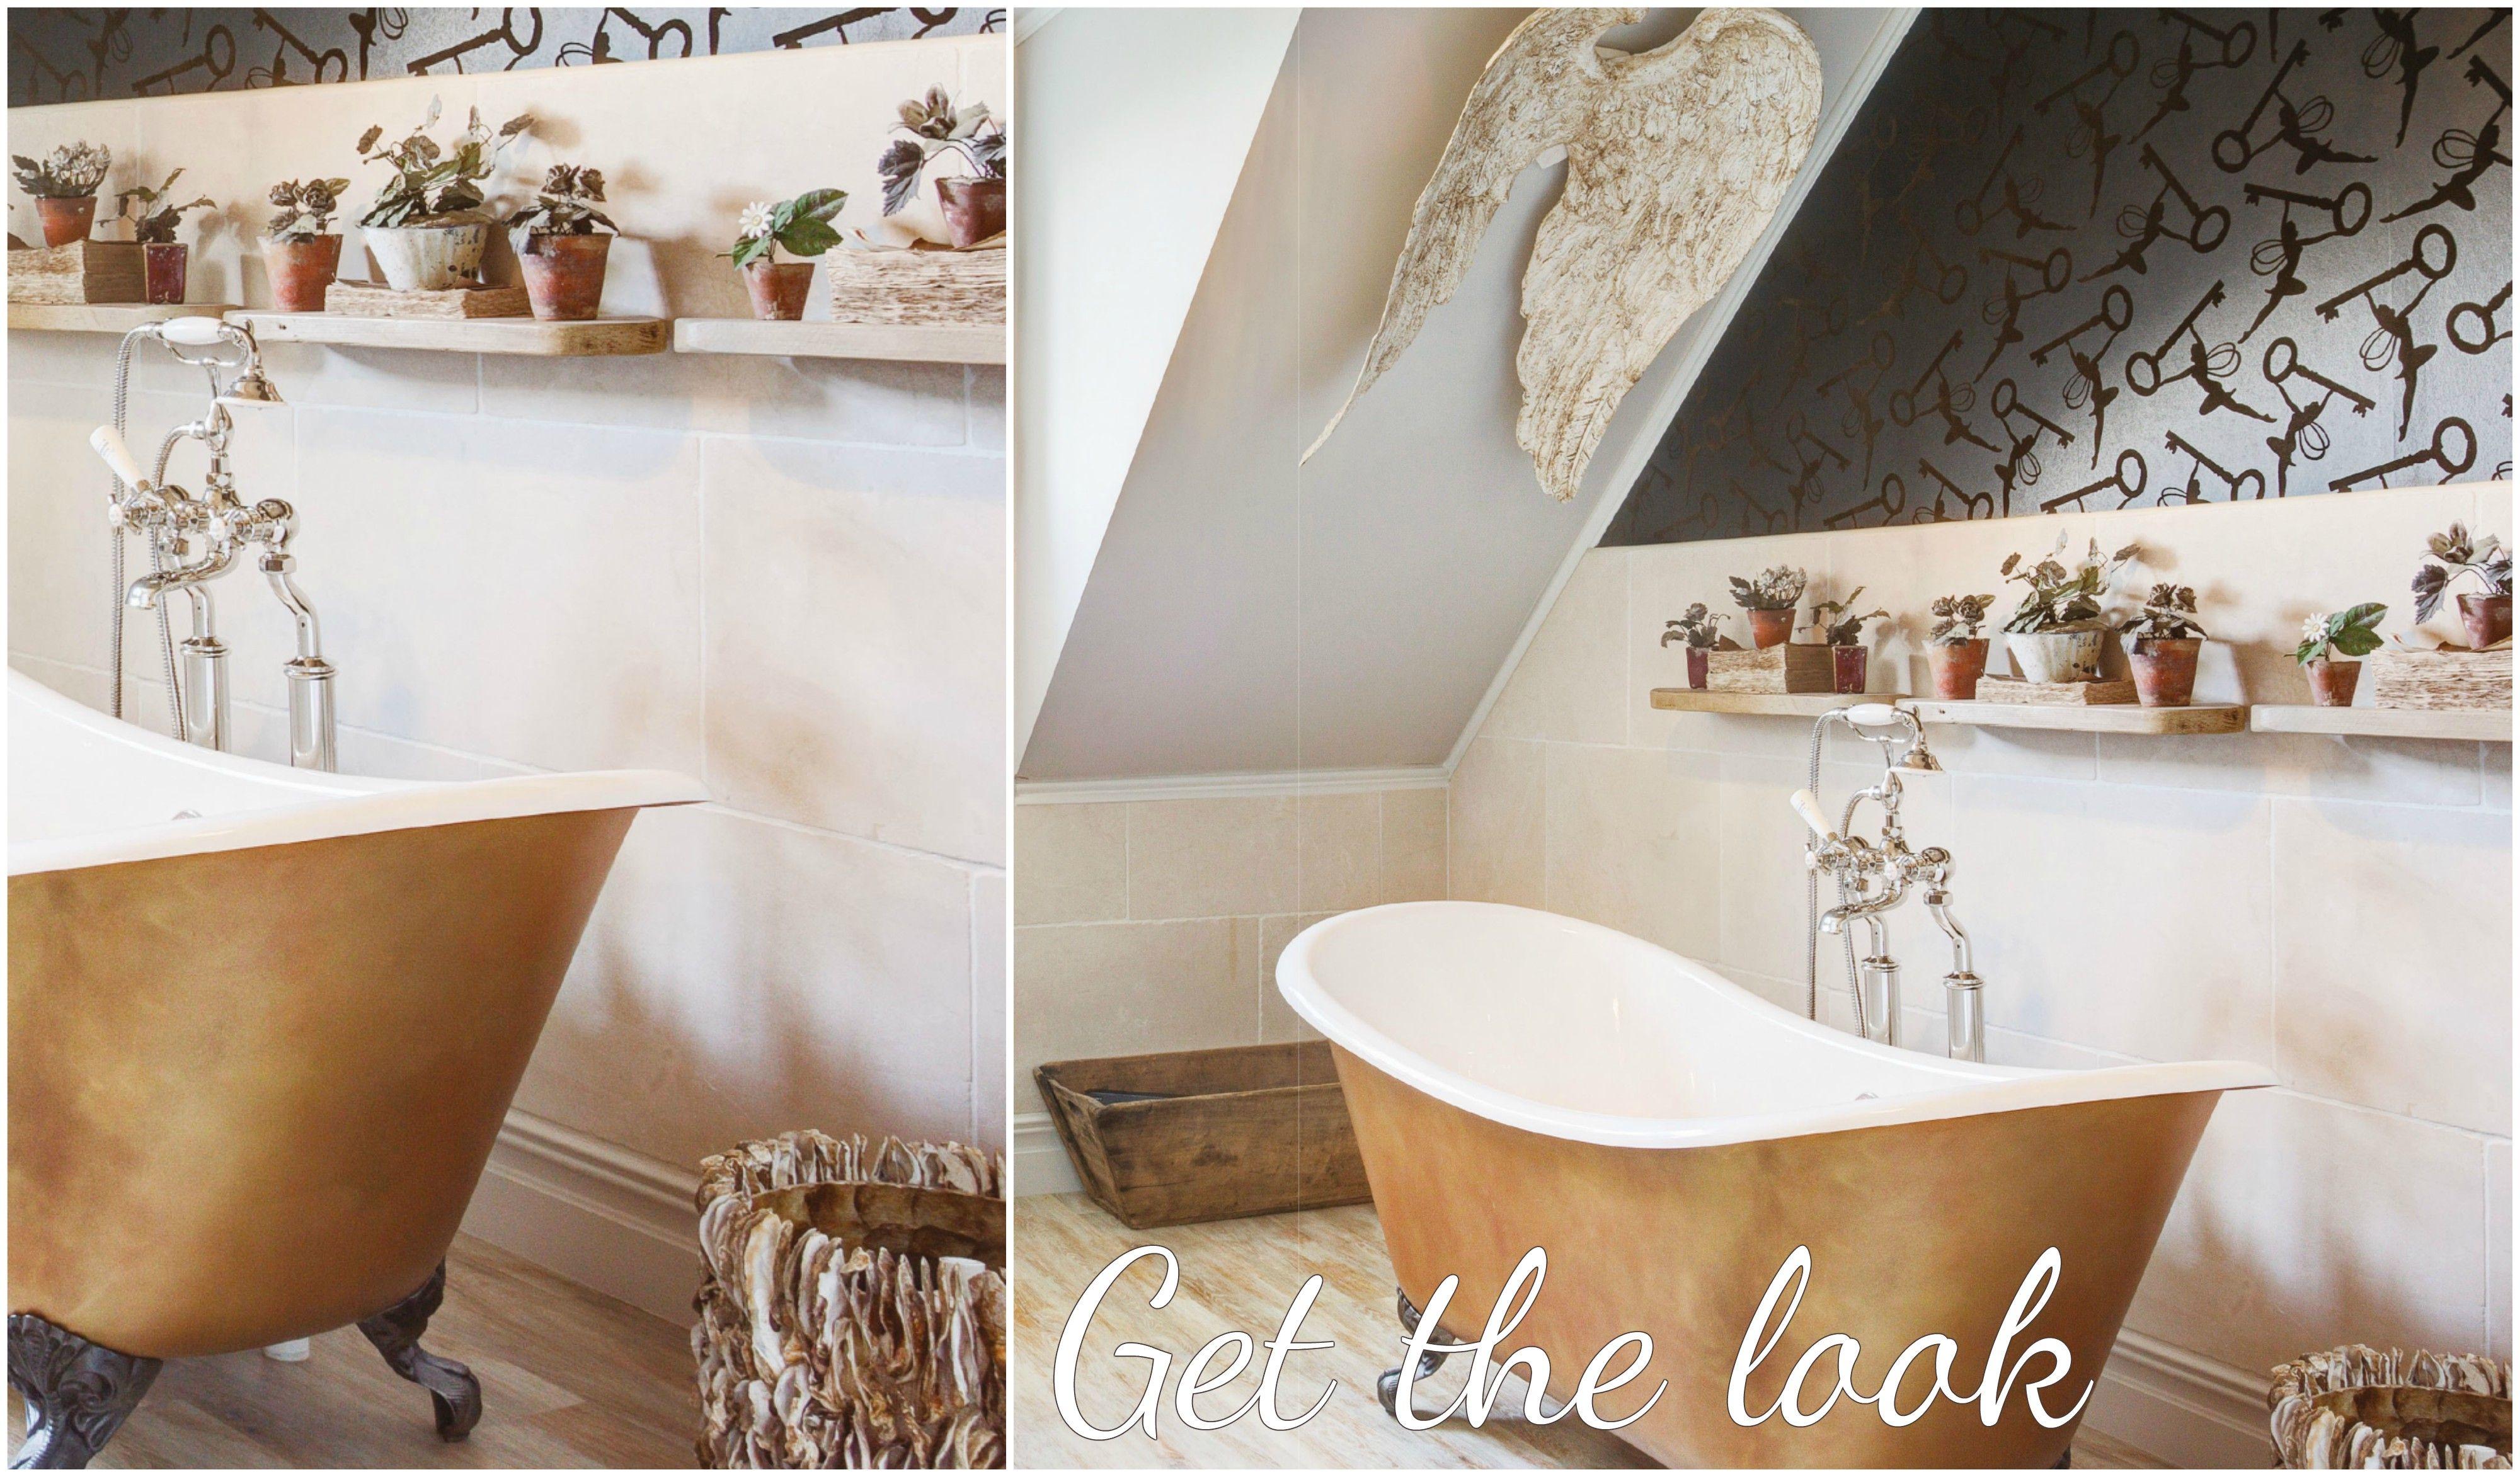 Metallic gold roll top bathtub - luxury bathroom idea